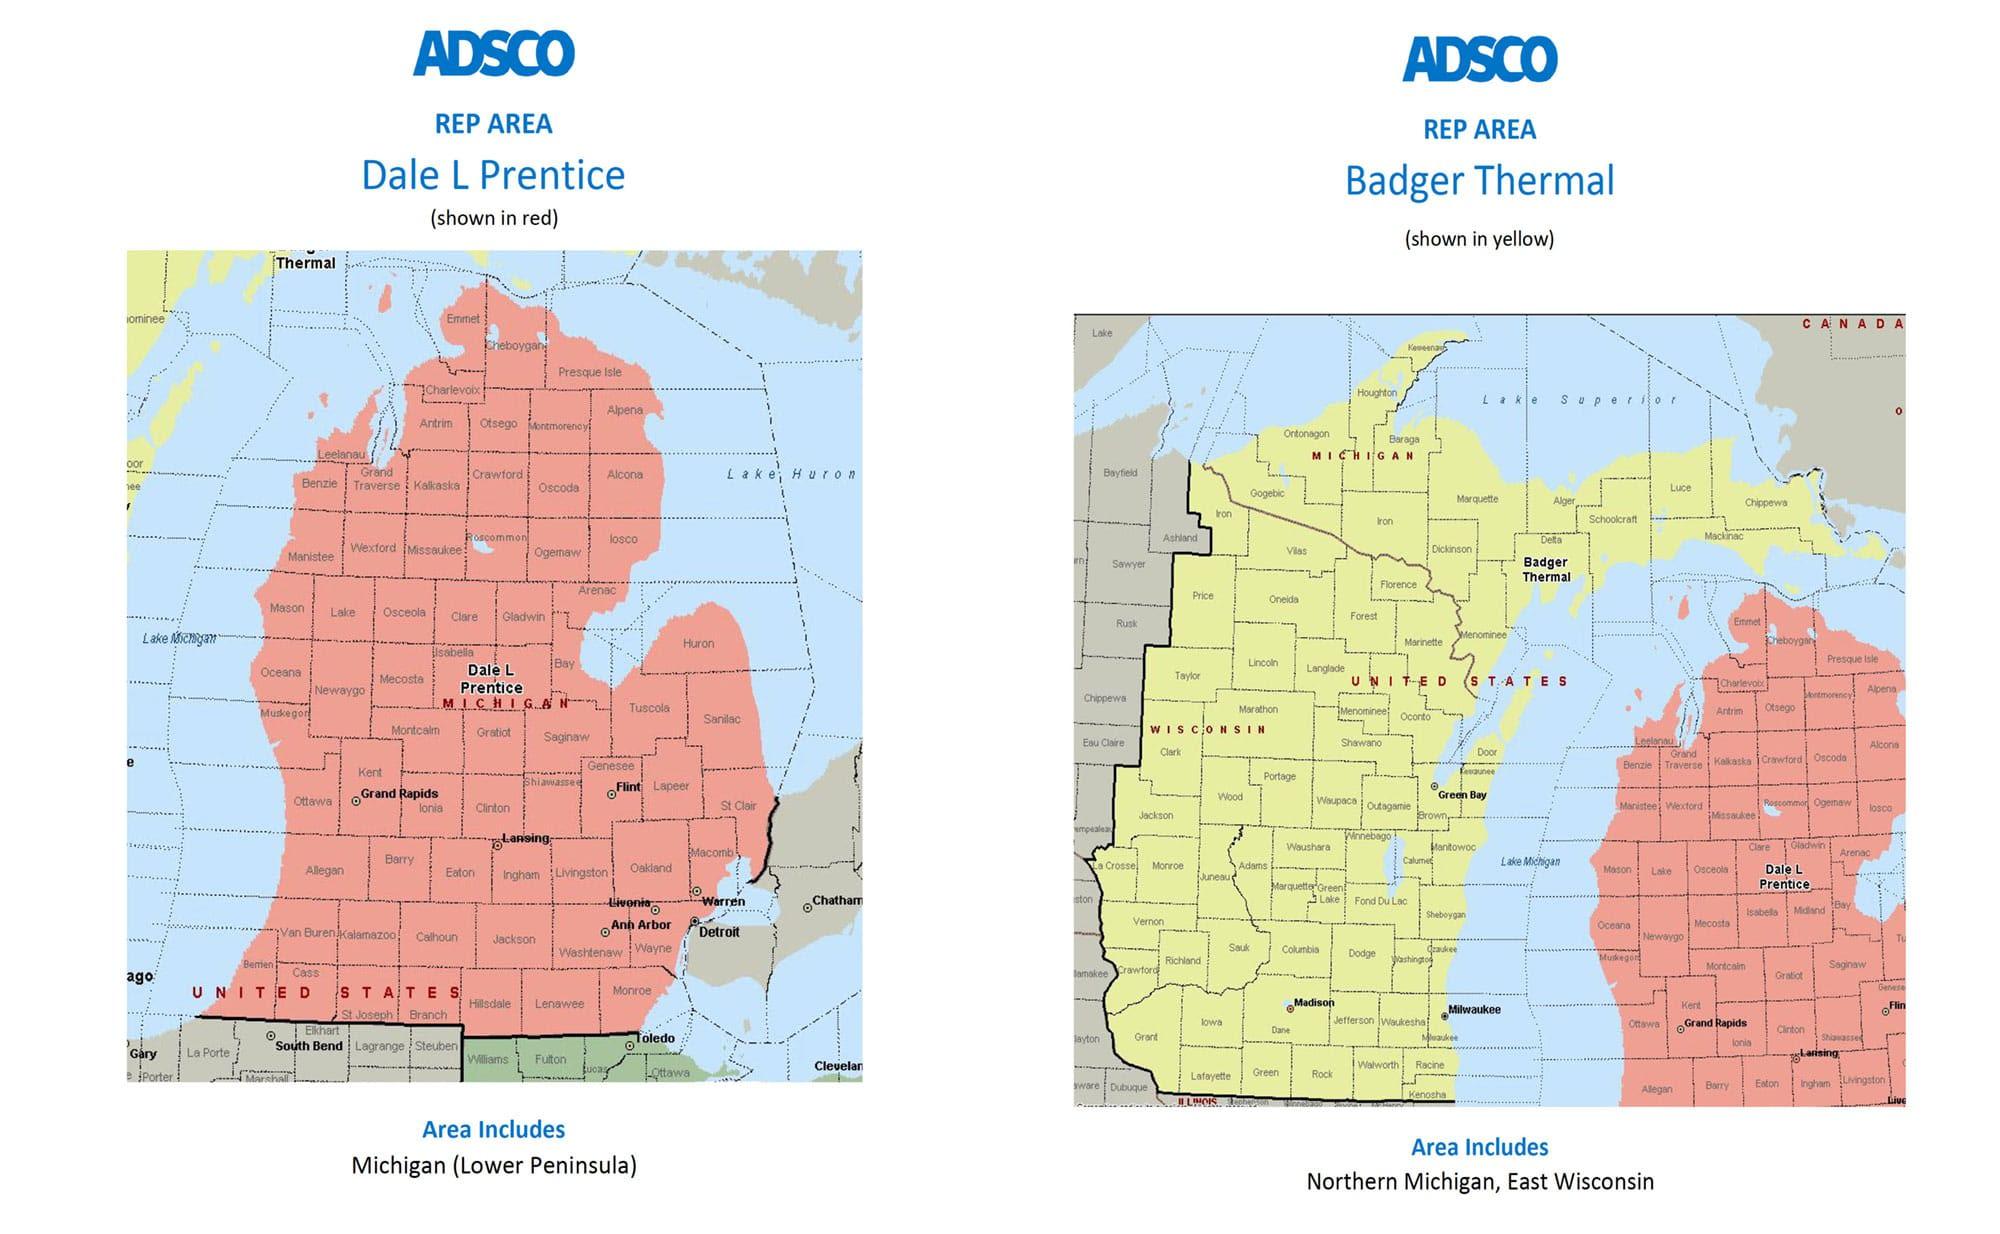 adsco reps Michigan and Wisconsin map